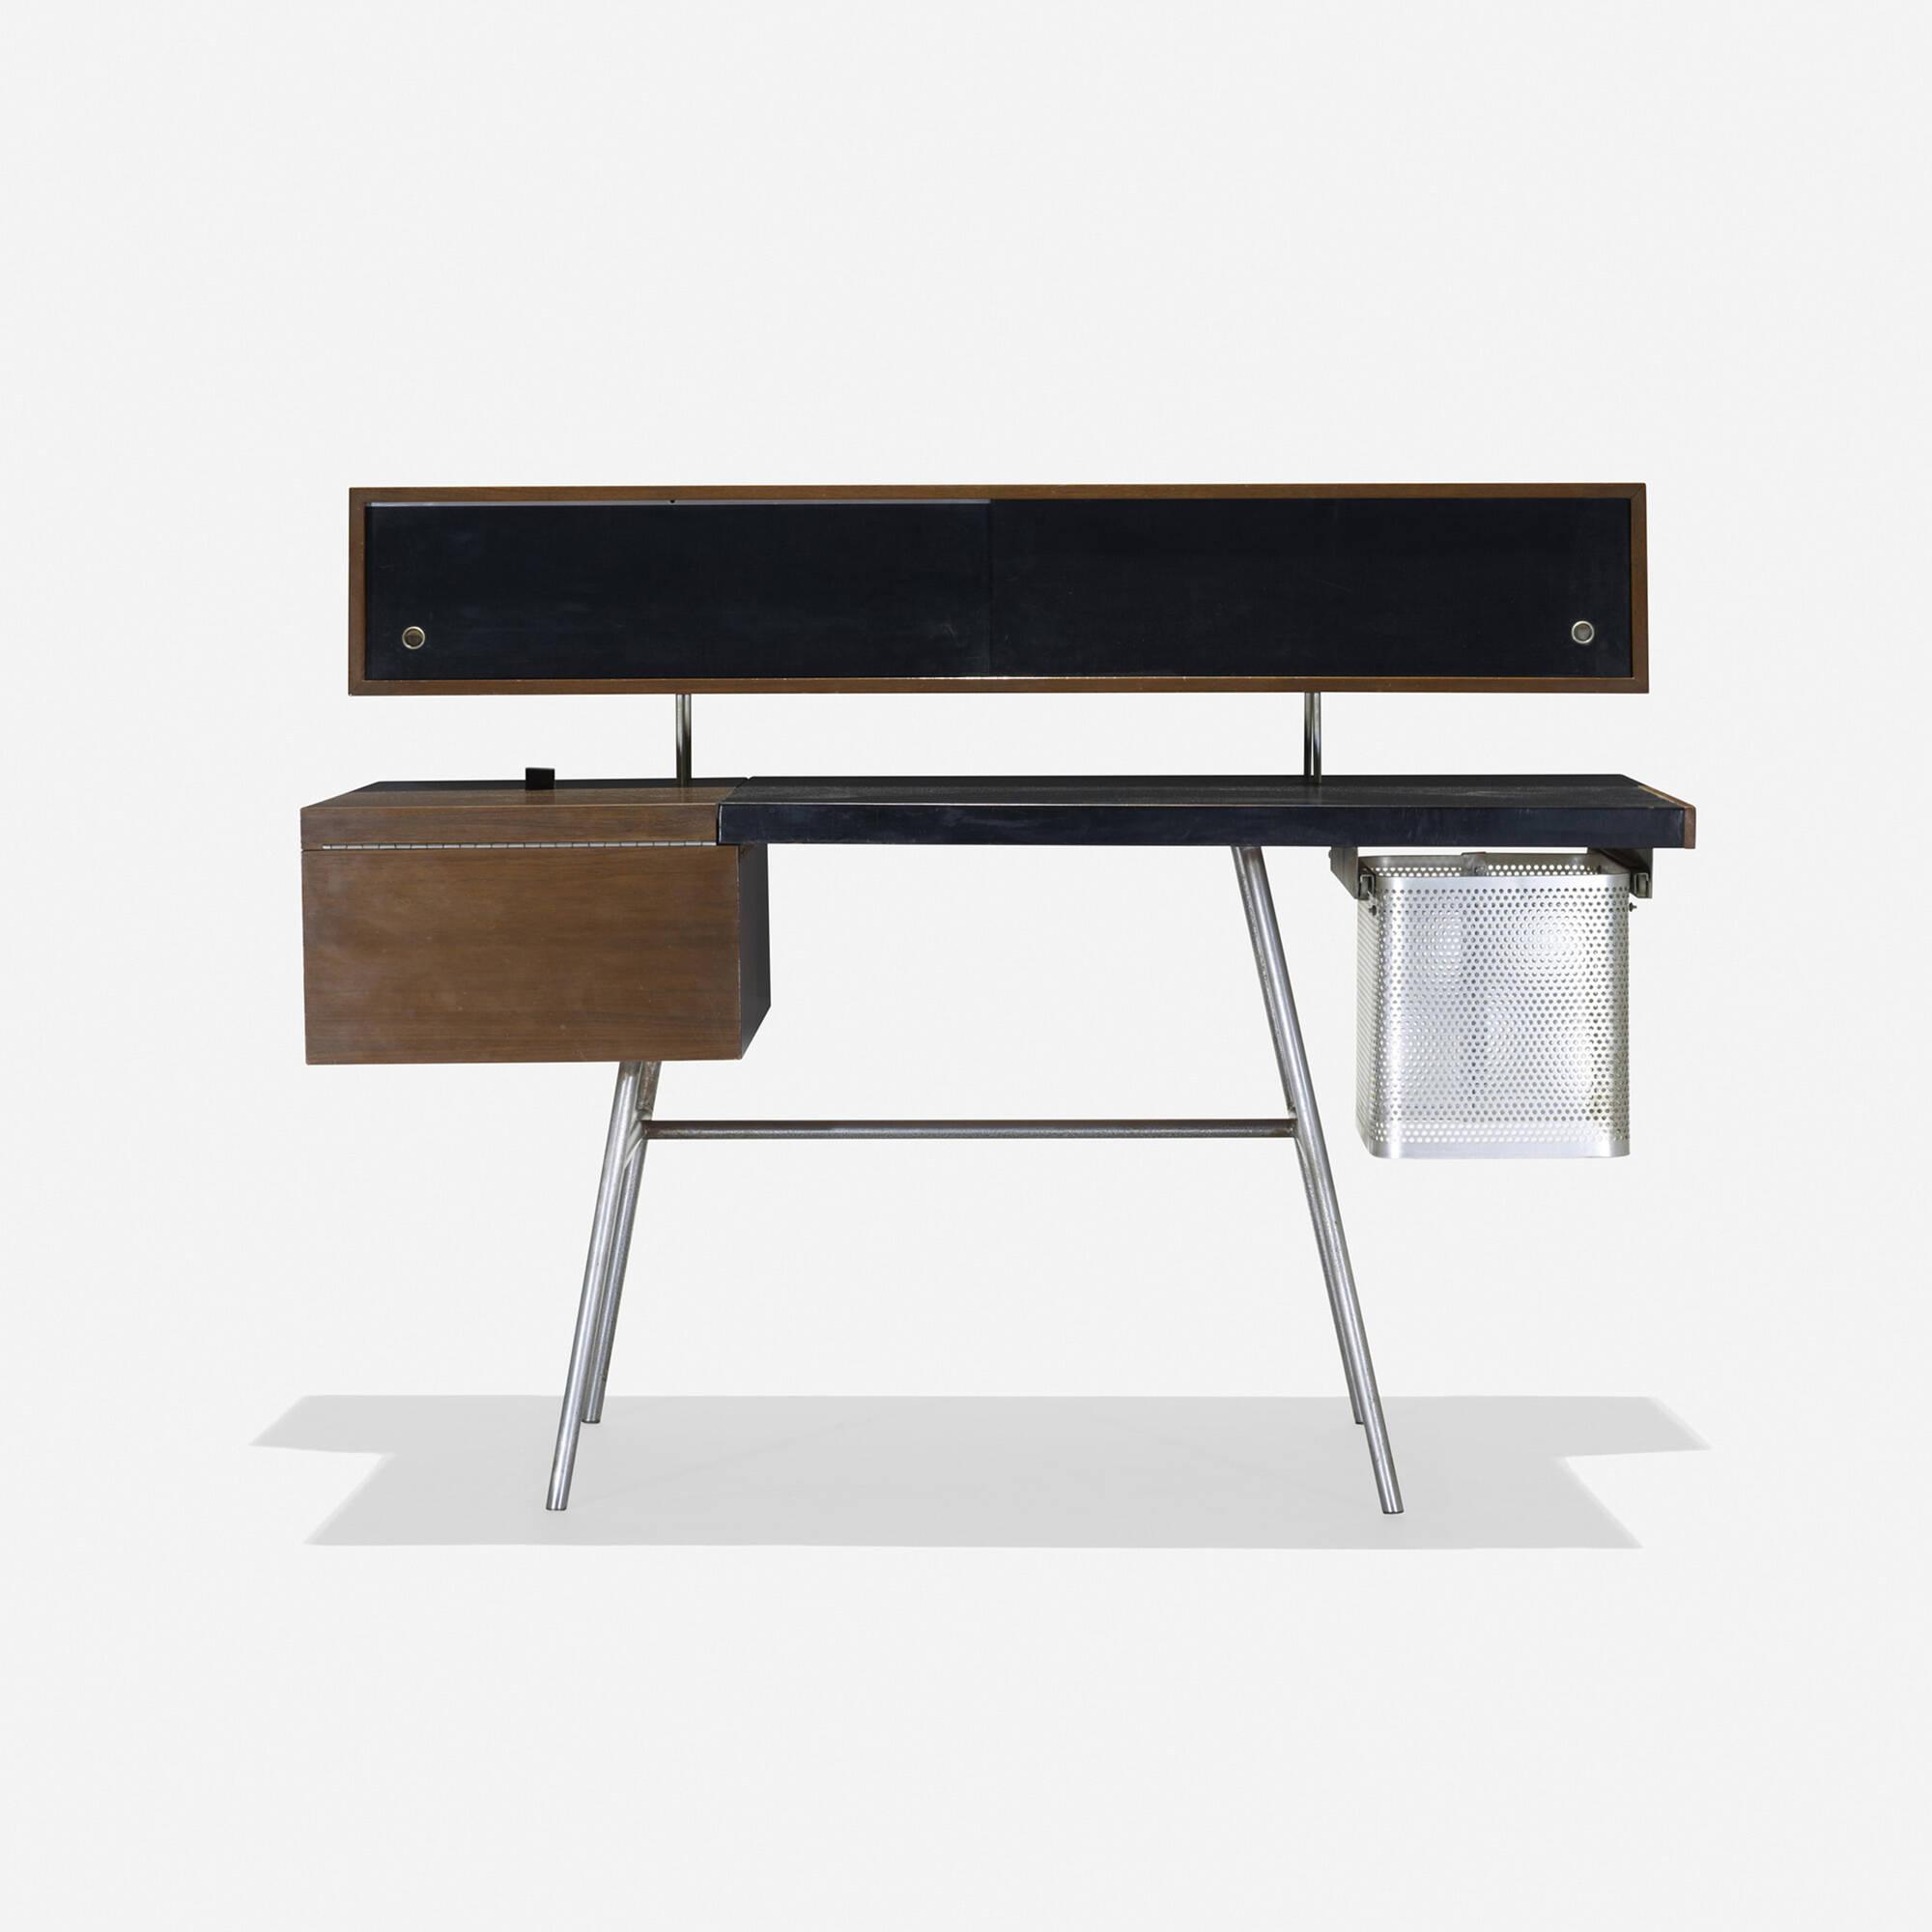 Modern Home Design October 2012: 126: George Nelson & Associates / Home Office Desk, Model 4658